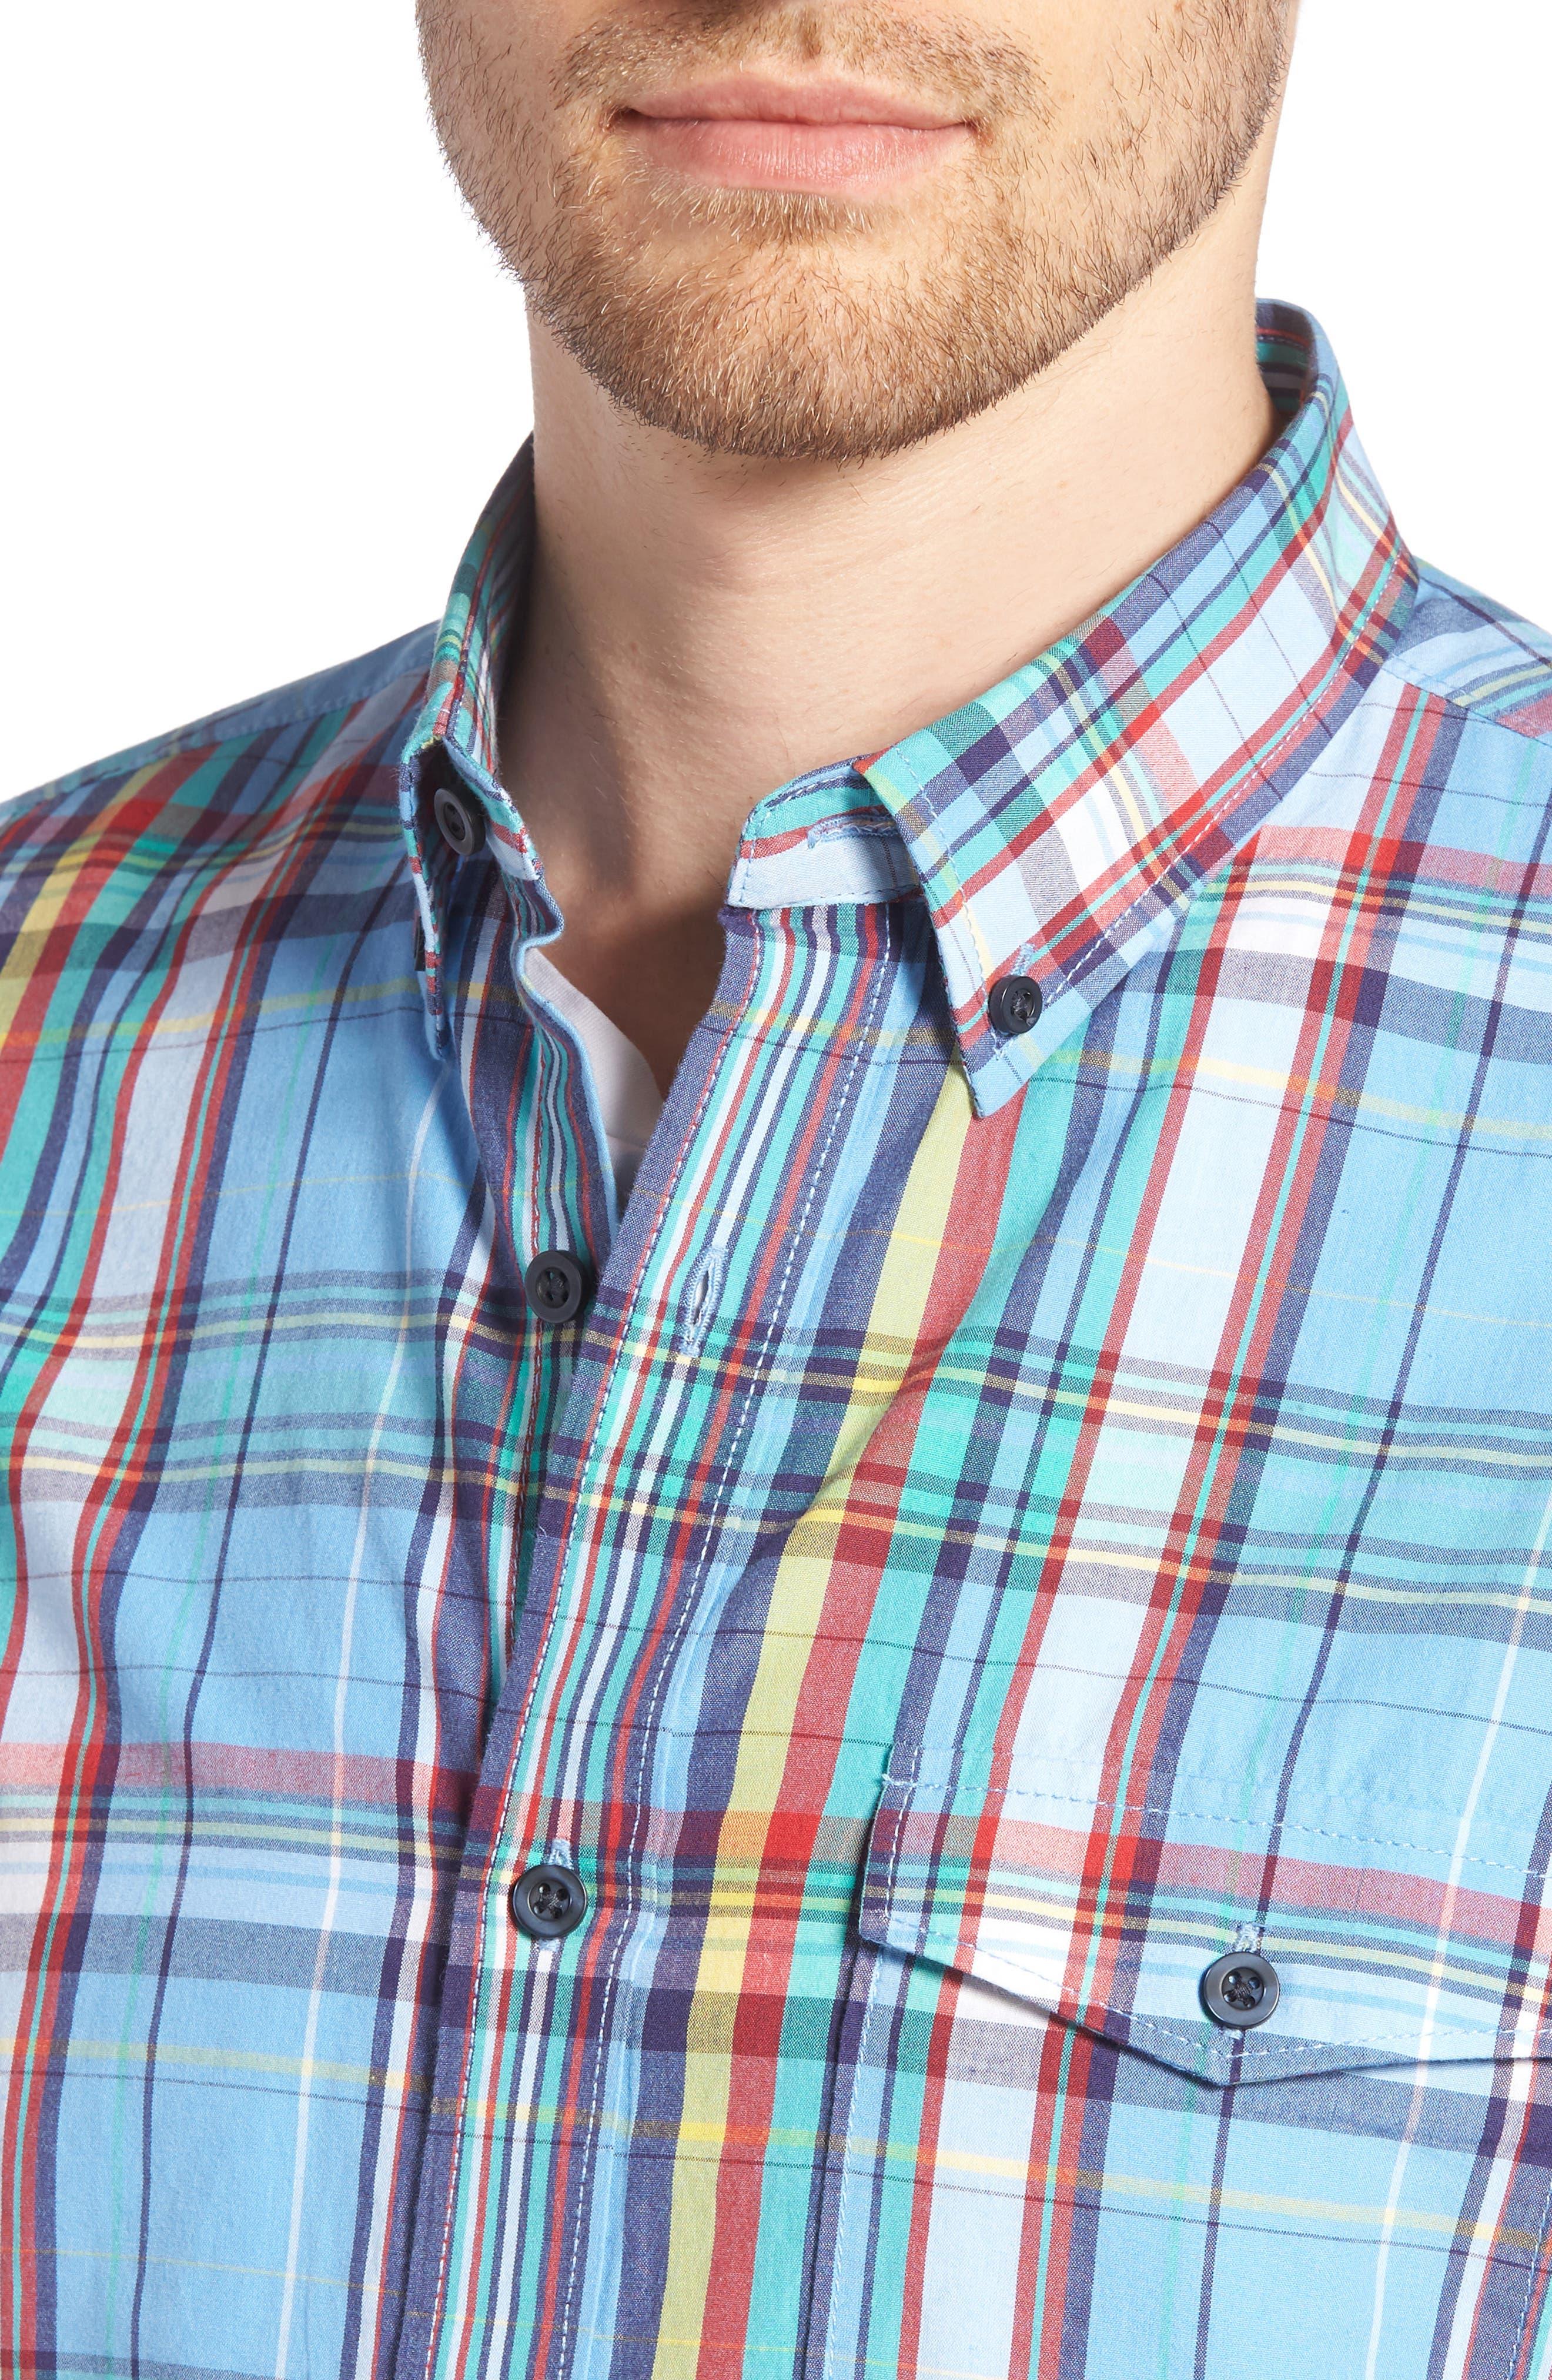 Ivy Trim Fit Madras Plaid Sport Shirt,                             Alternate thumbnail 2, color,                             Blue Chambray Multi Plaid